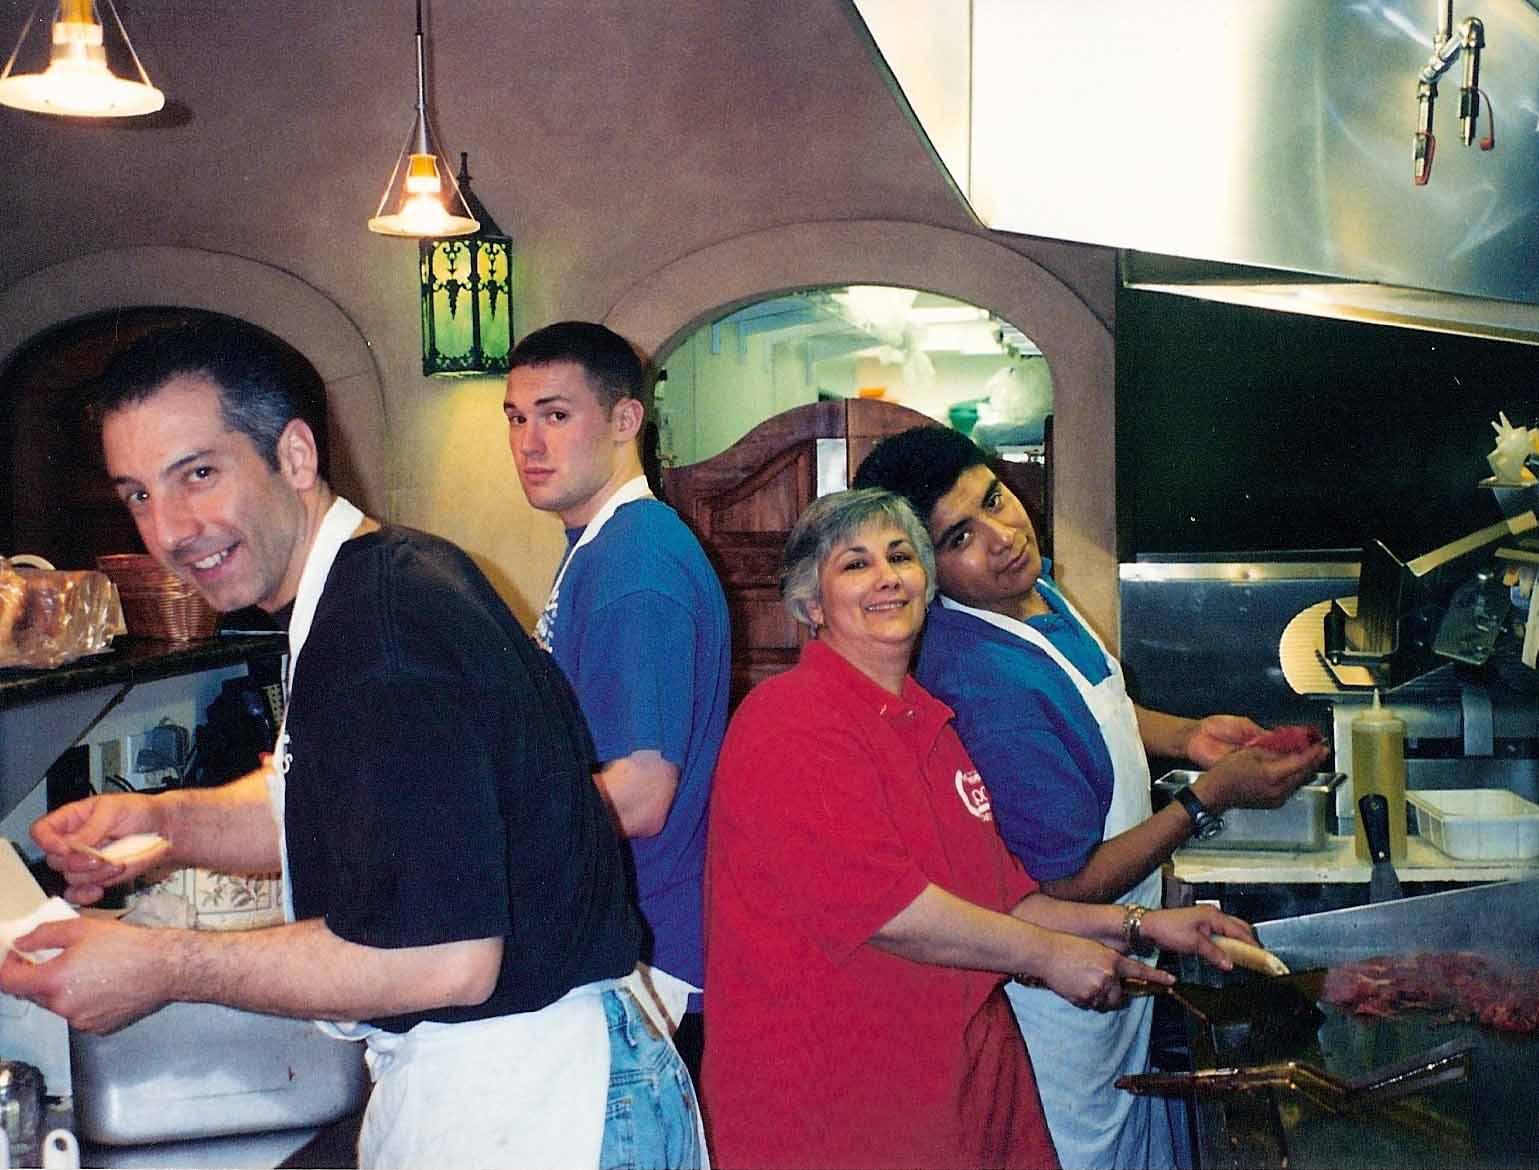 Best Cheesesteak in Philadelphia - Campos in the Kitchen